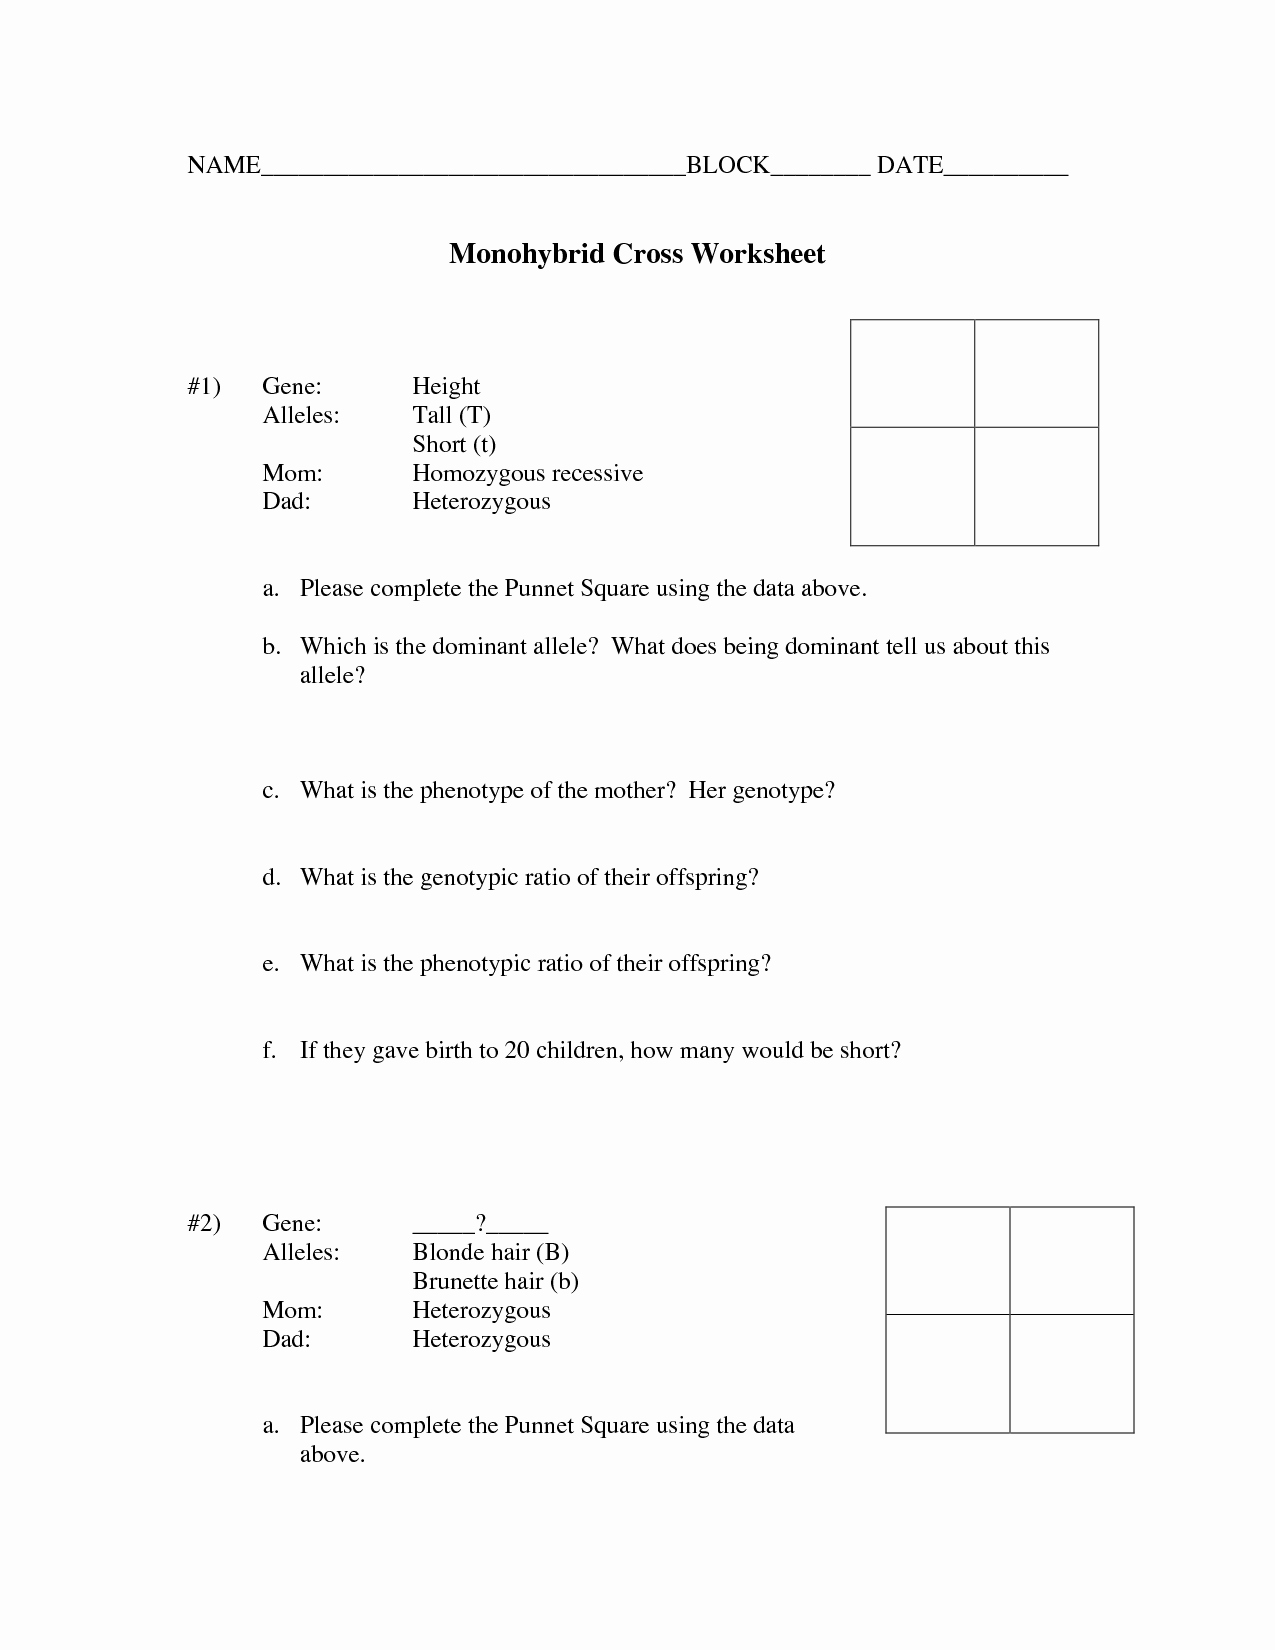 Dihybrid Cross Worksheet Answers Unique 15 Best Of Dihybrid Cross Worksheet Answers